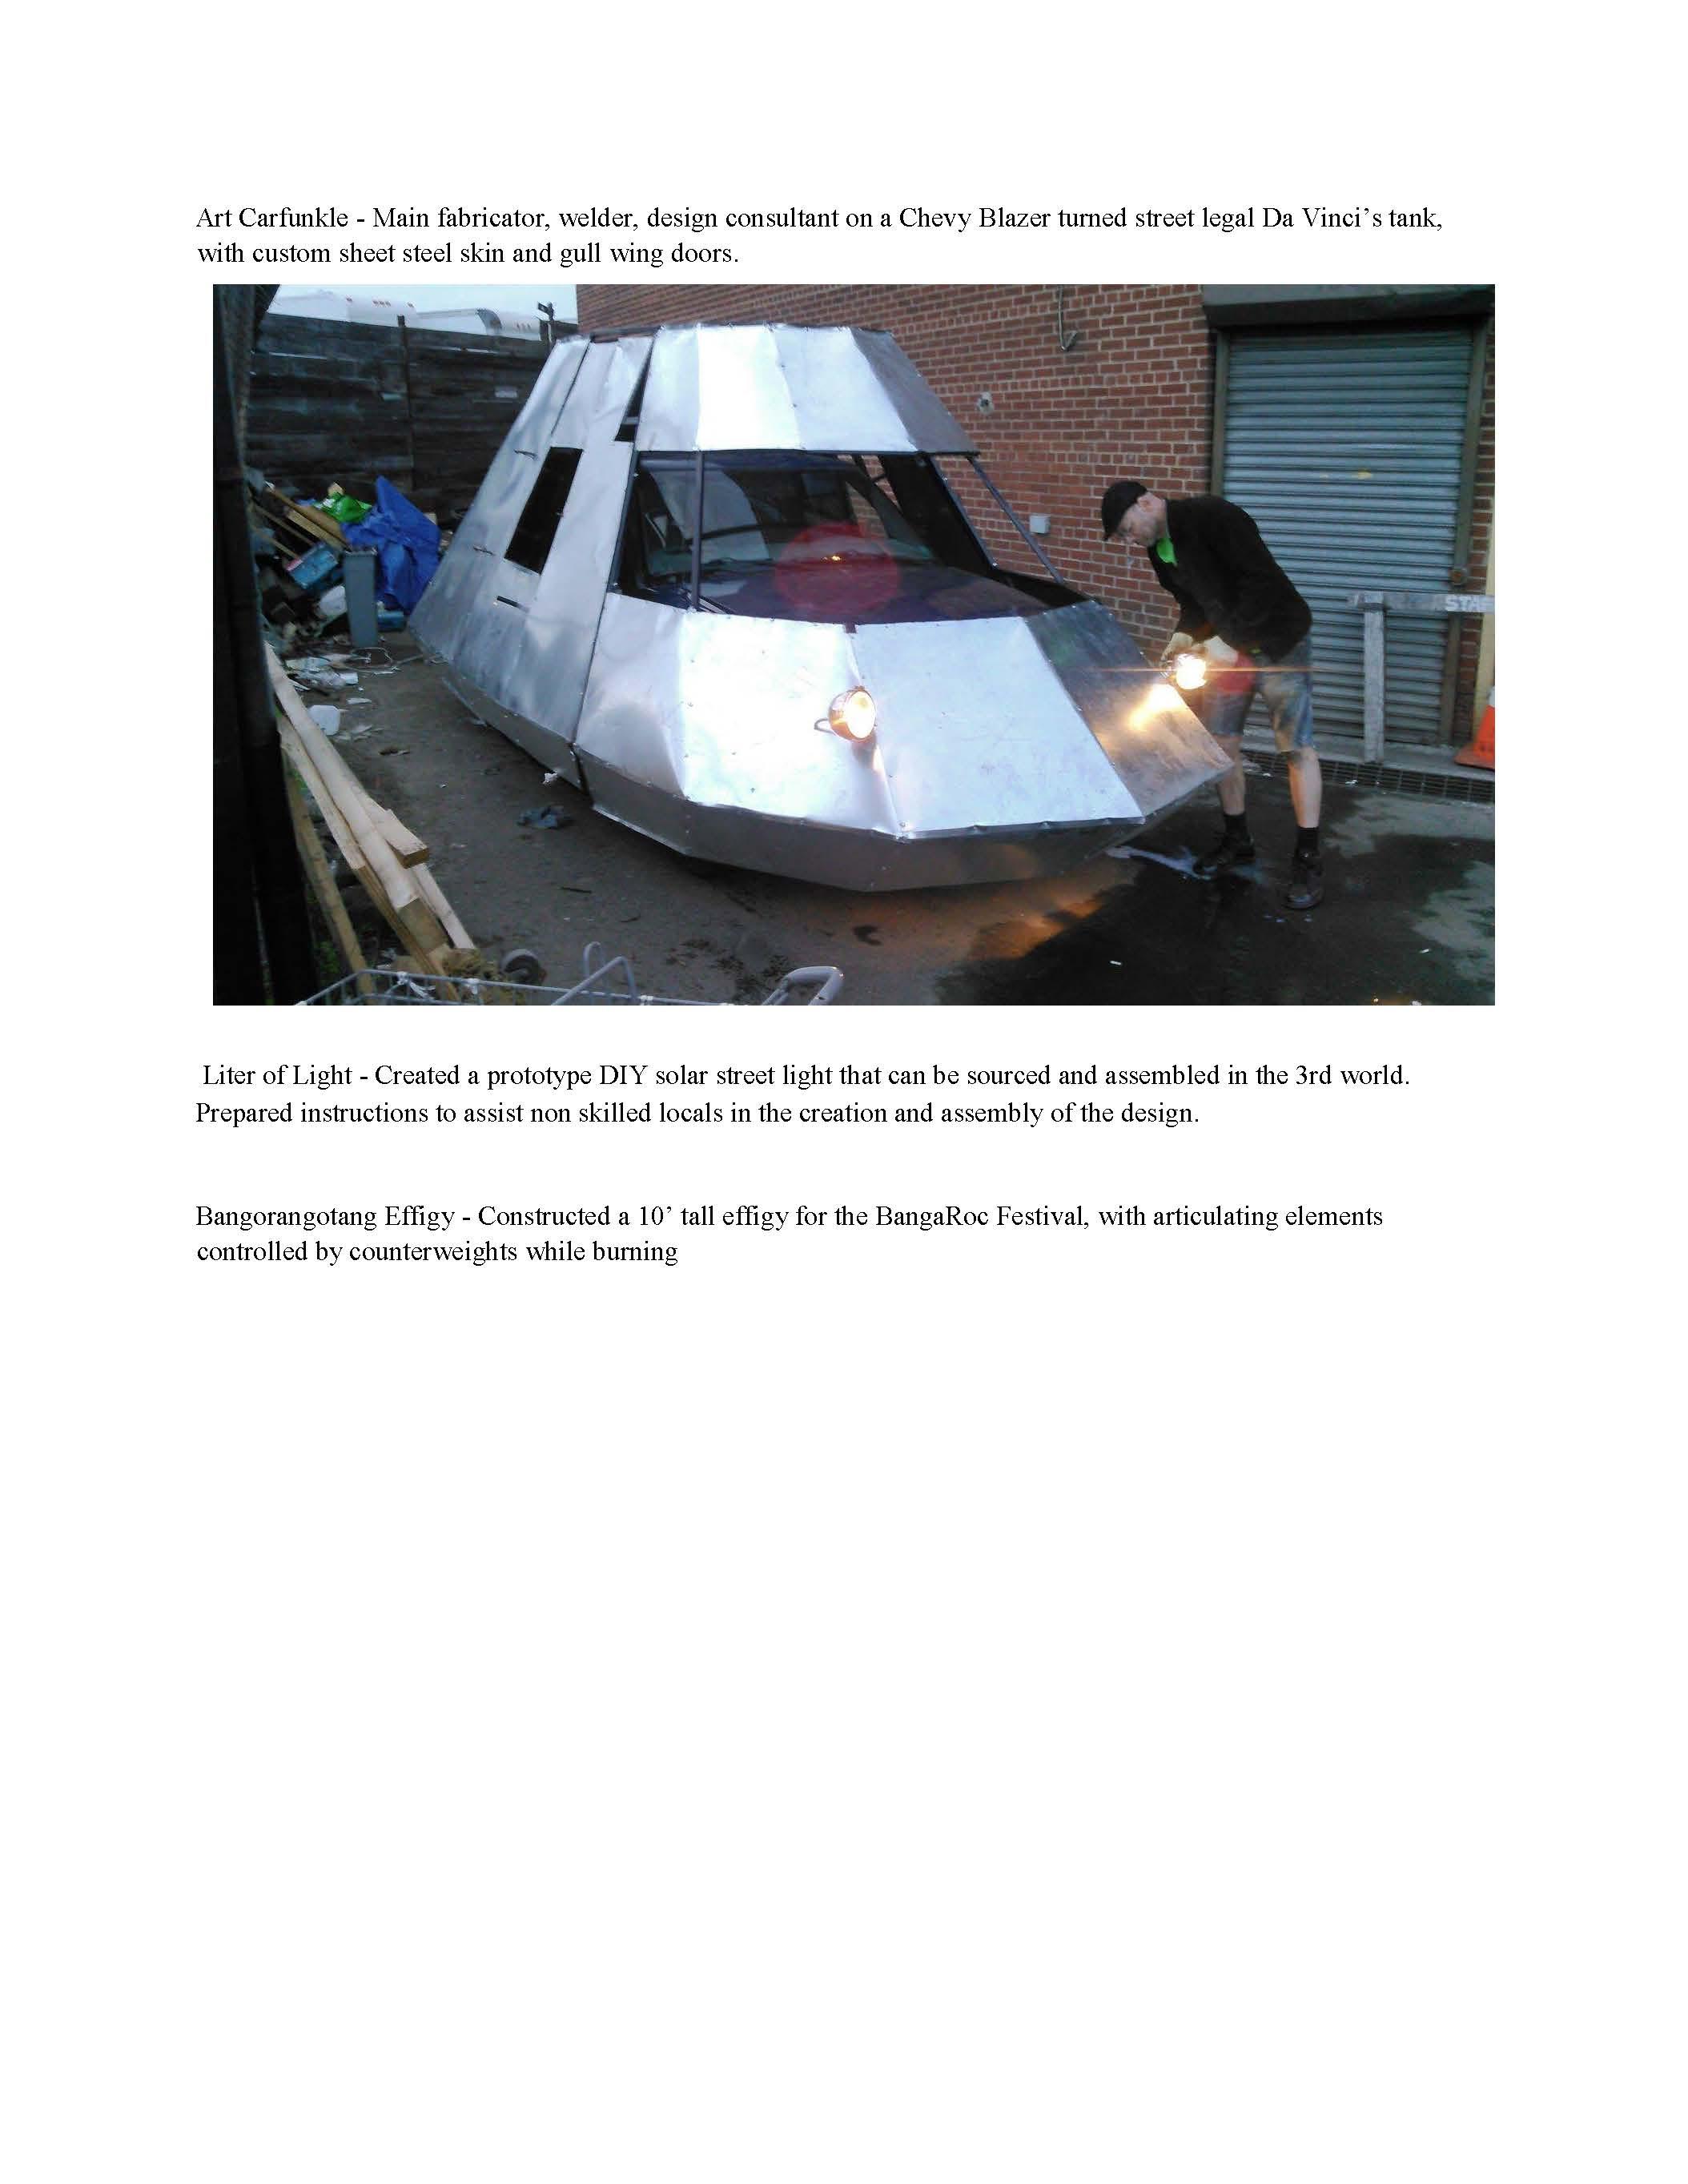 randys porfolio for slideshow_Page_14.jpg